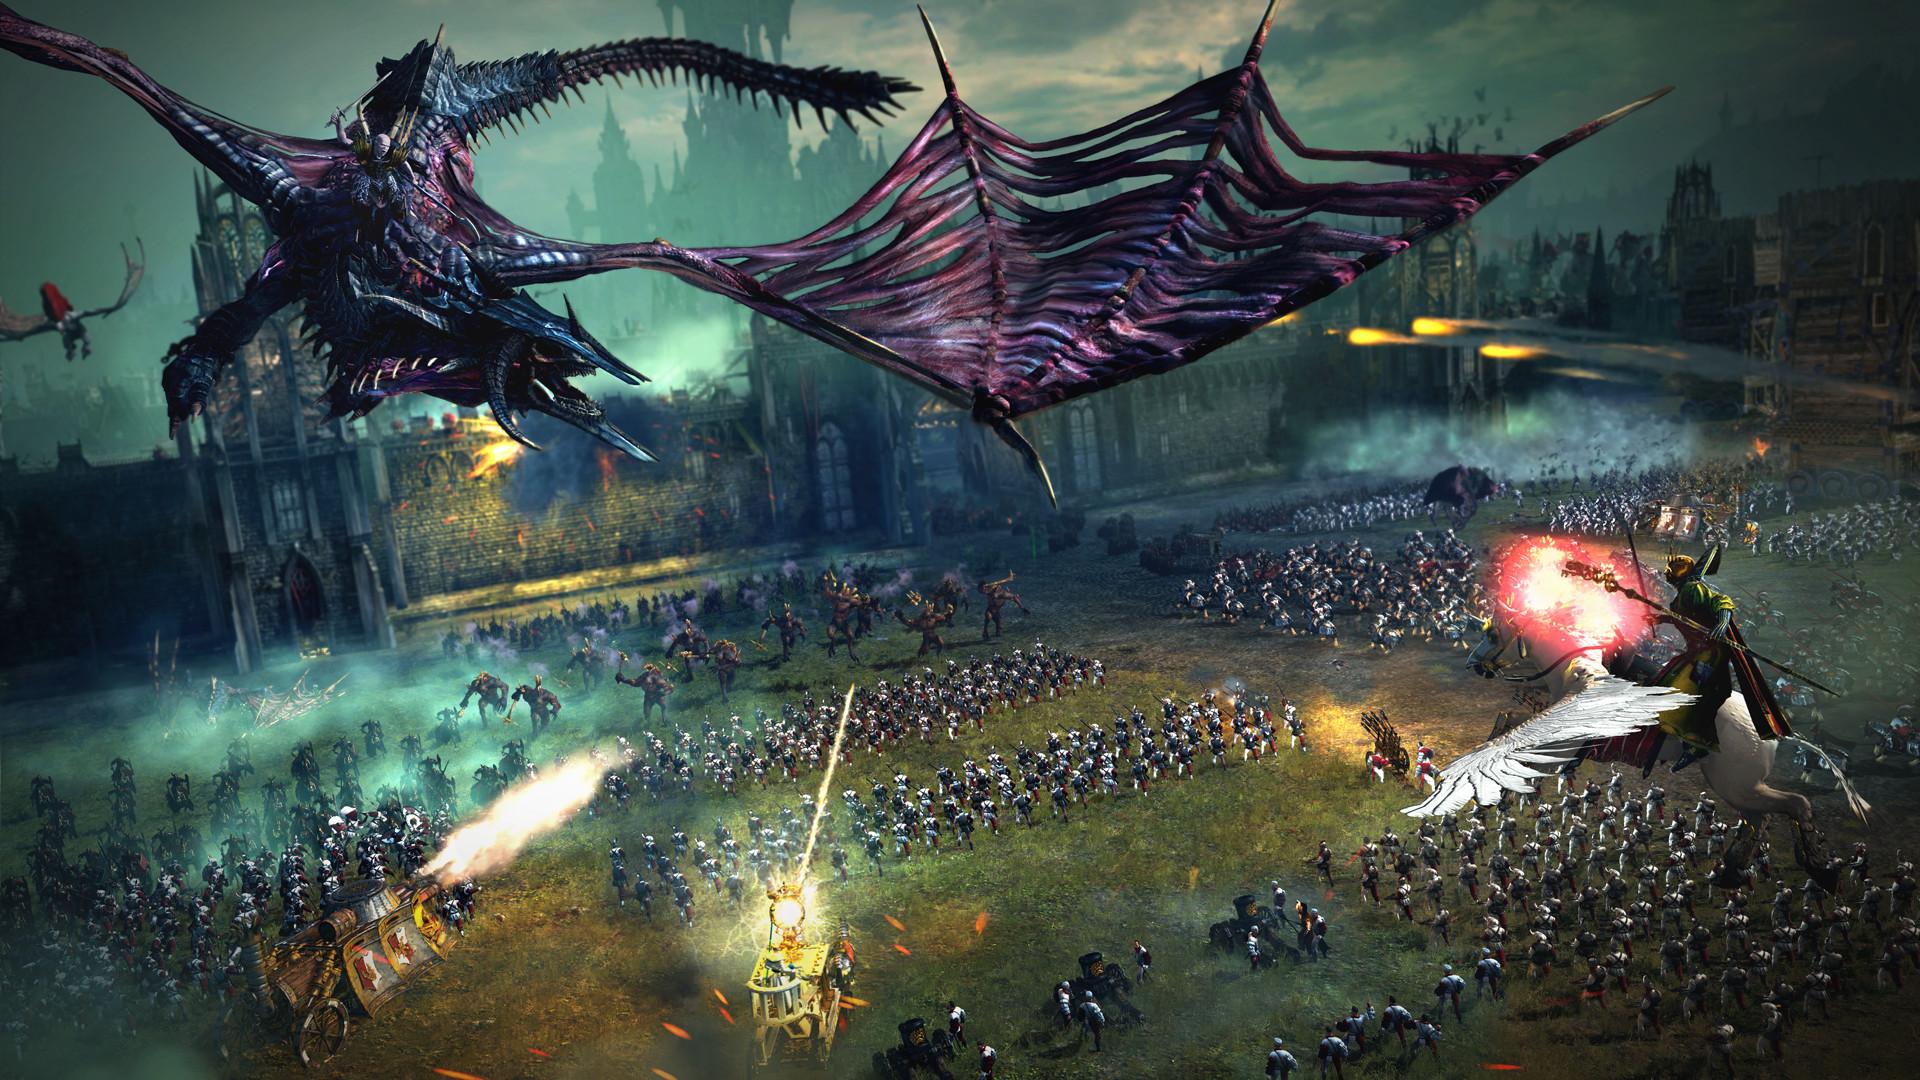 ss_5f63ca59389d935731b20f9b2596040a0d9392fc.1920x1080 Total War: Warhammer First Impressions